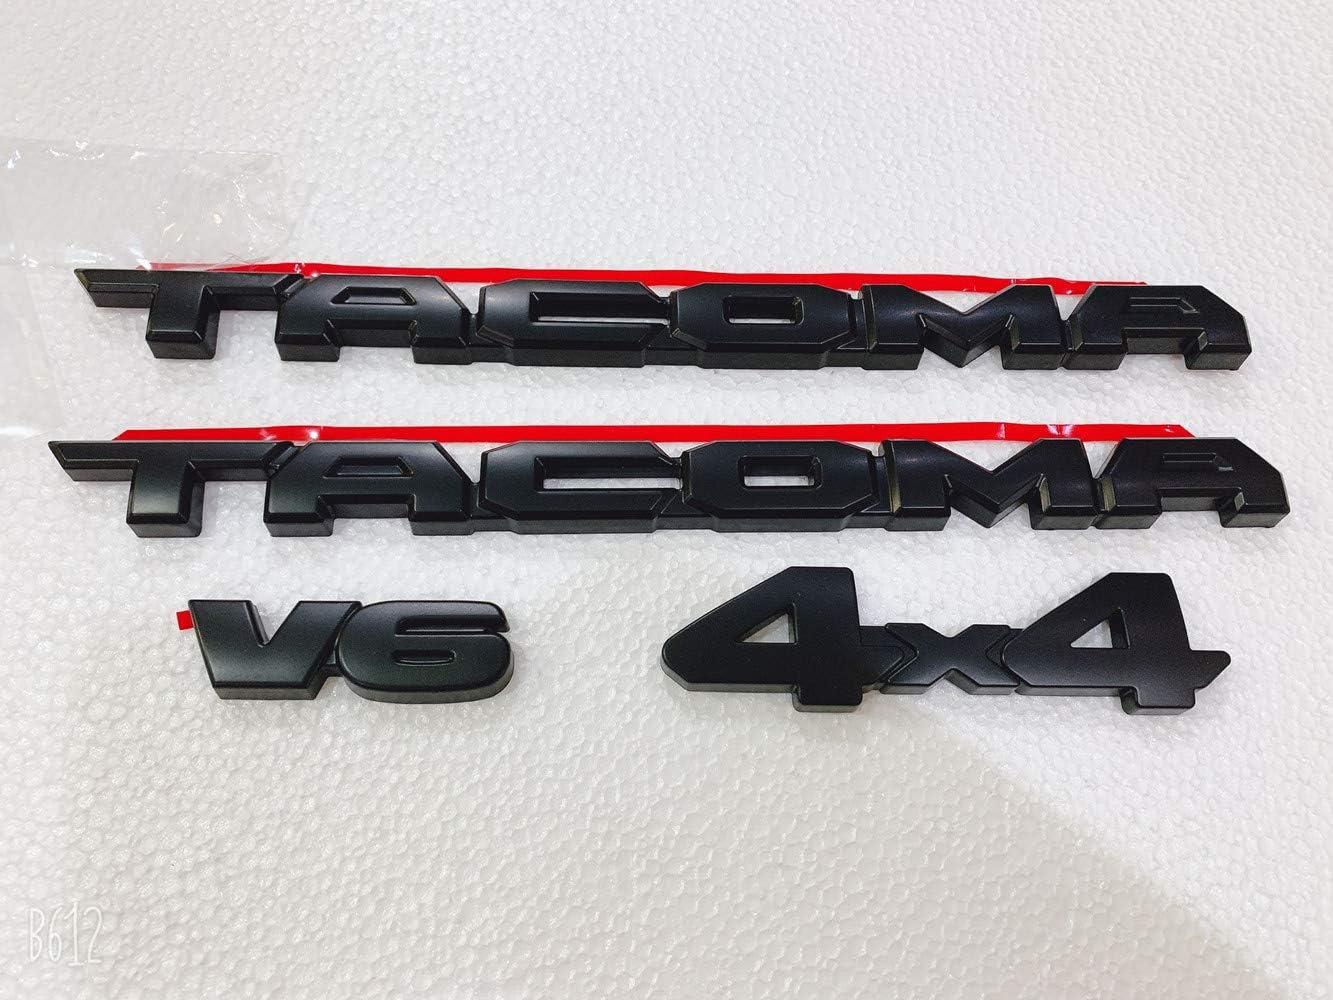 Tacoma 1-4X4 1 V6》 4PCS FOR 2016-2019 Tacoma Blackout Emblem Overlays ABS Plastic OEM PT948-35180-02 《2